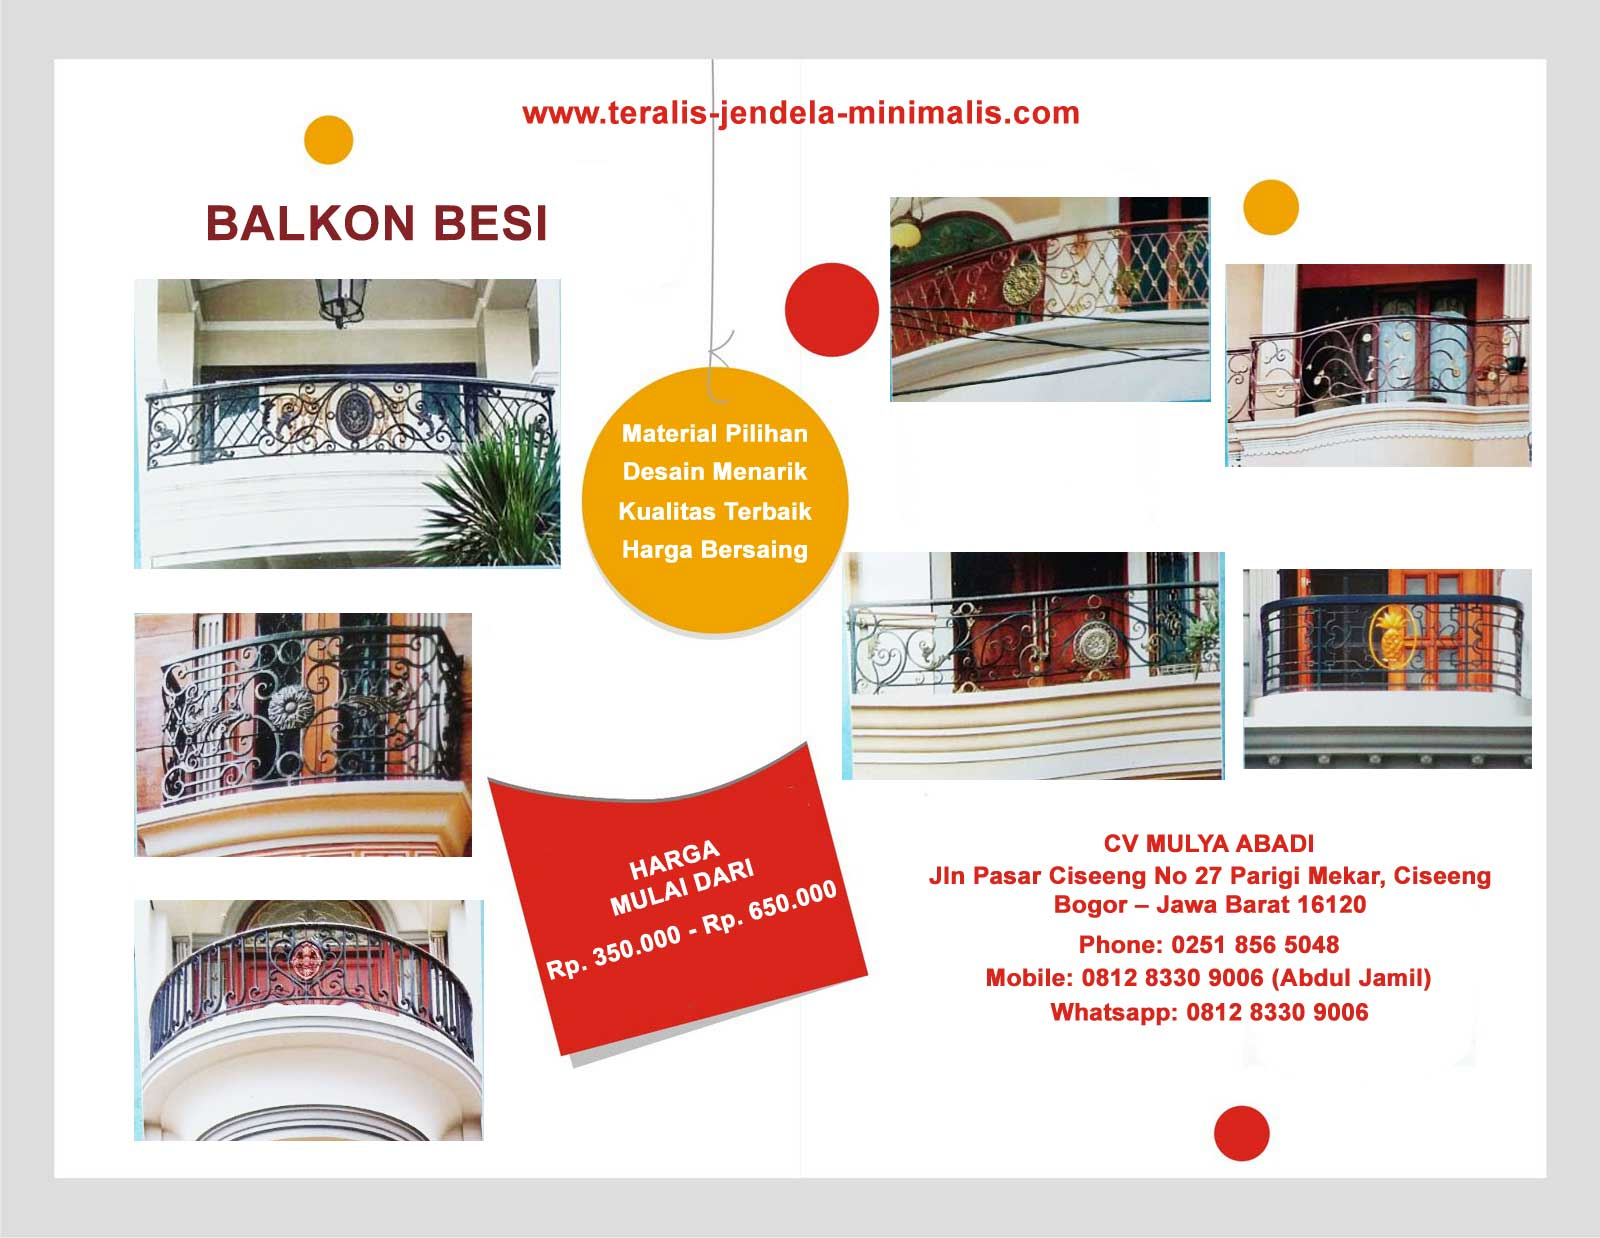 Harga Balkon Besi